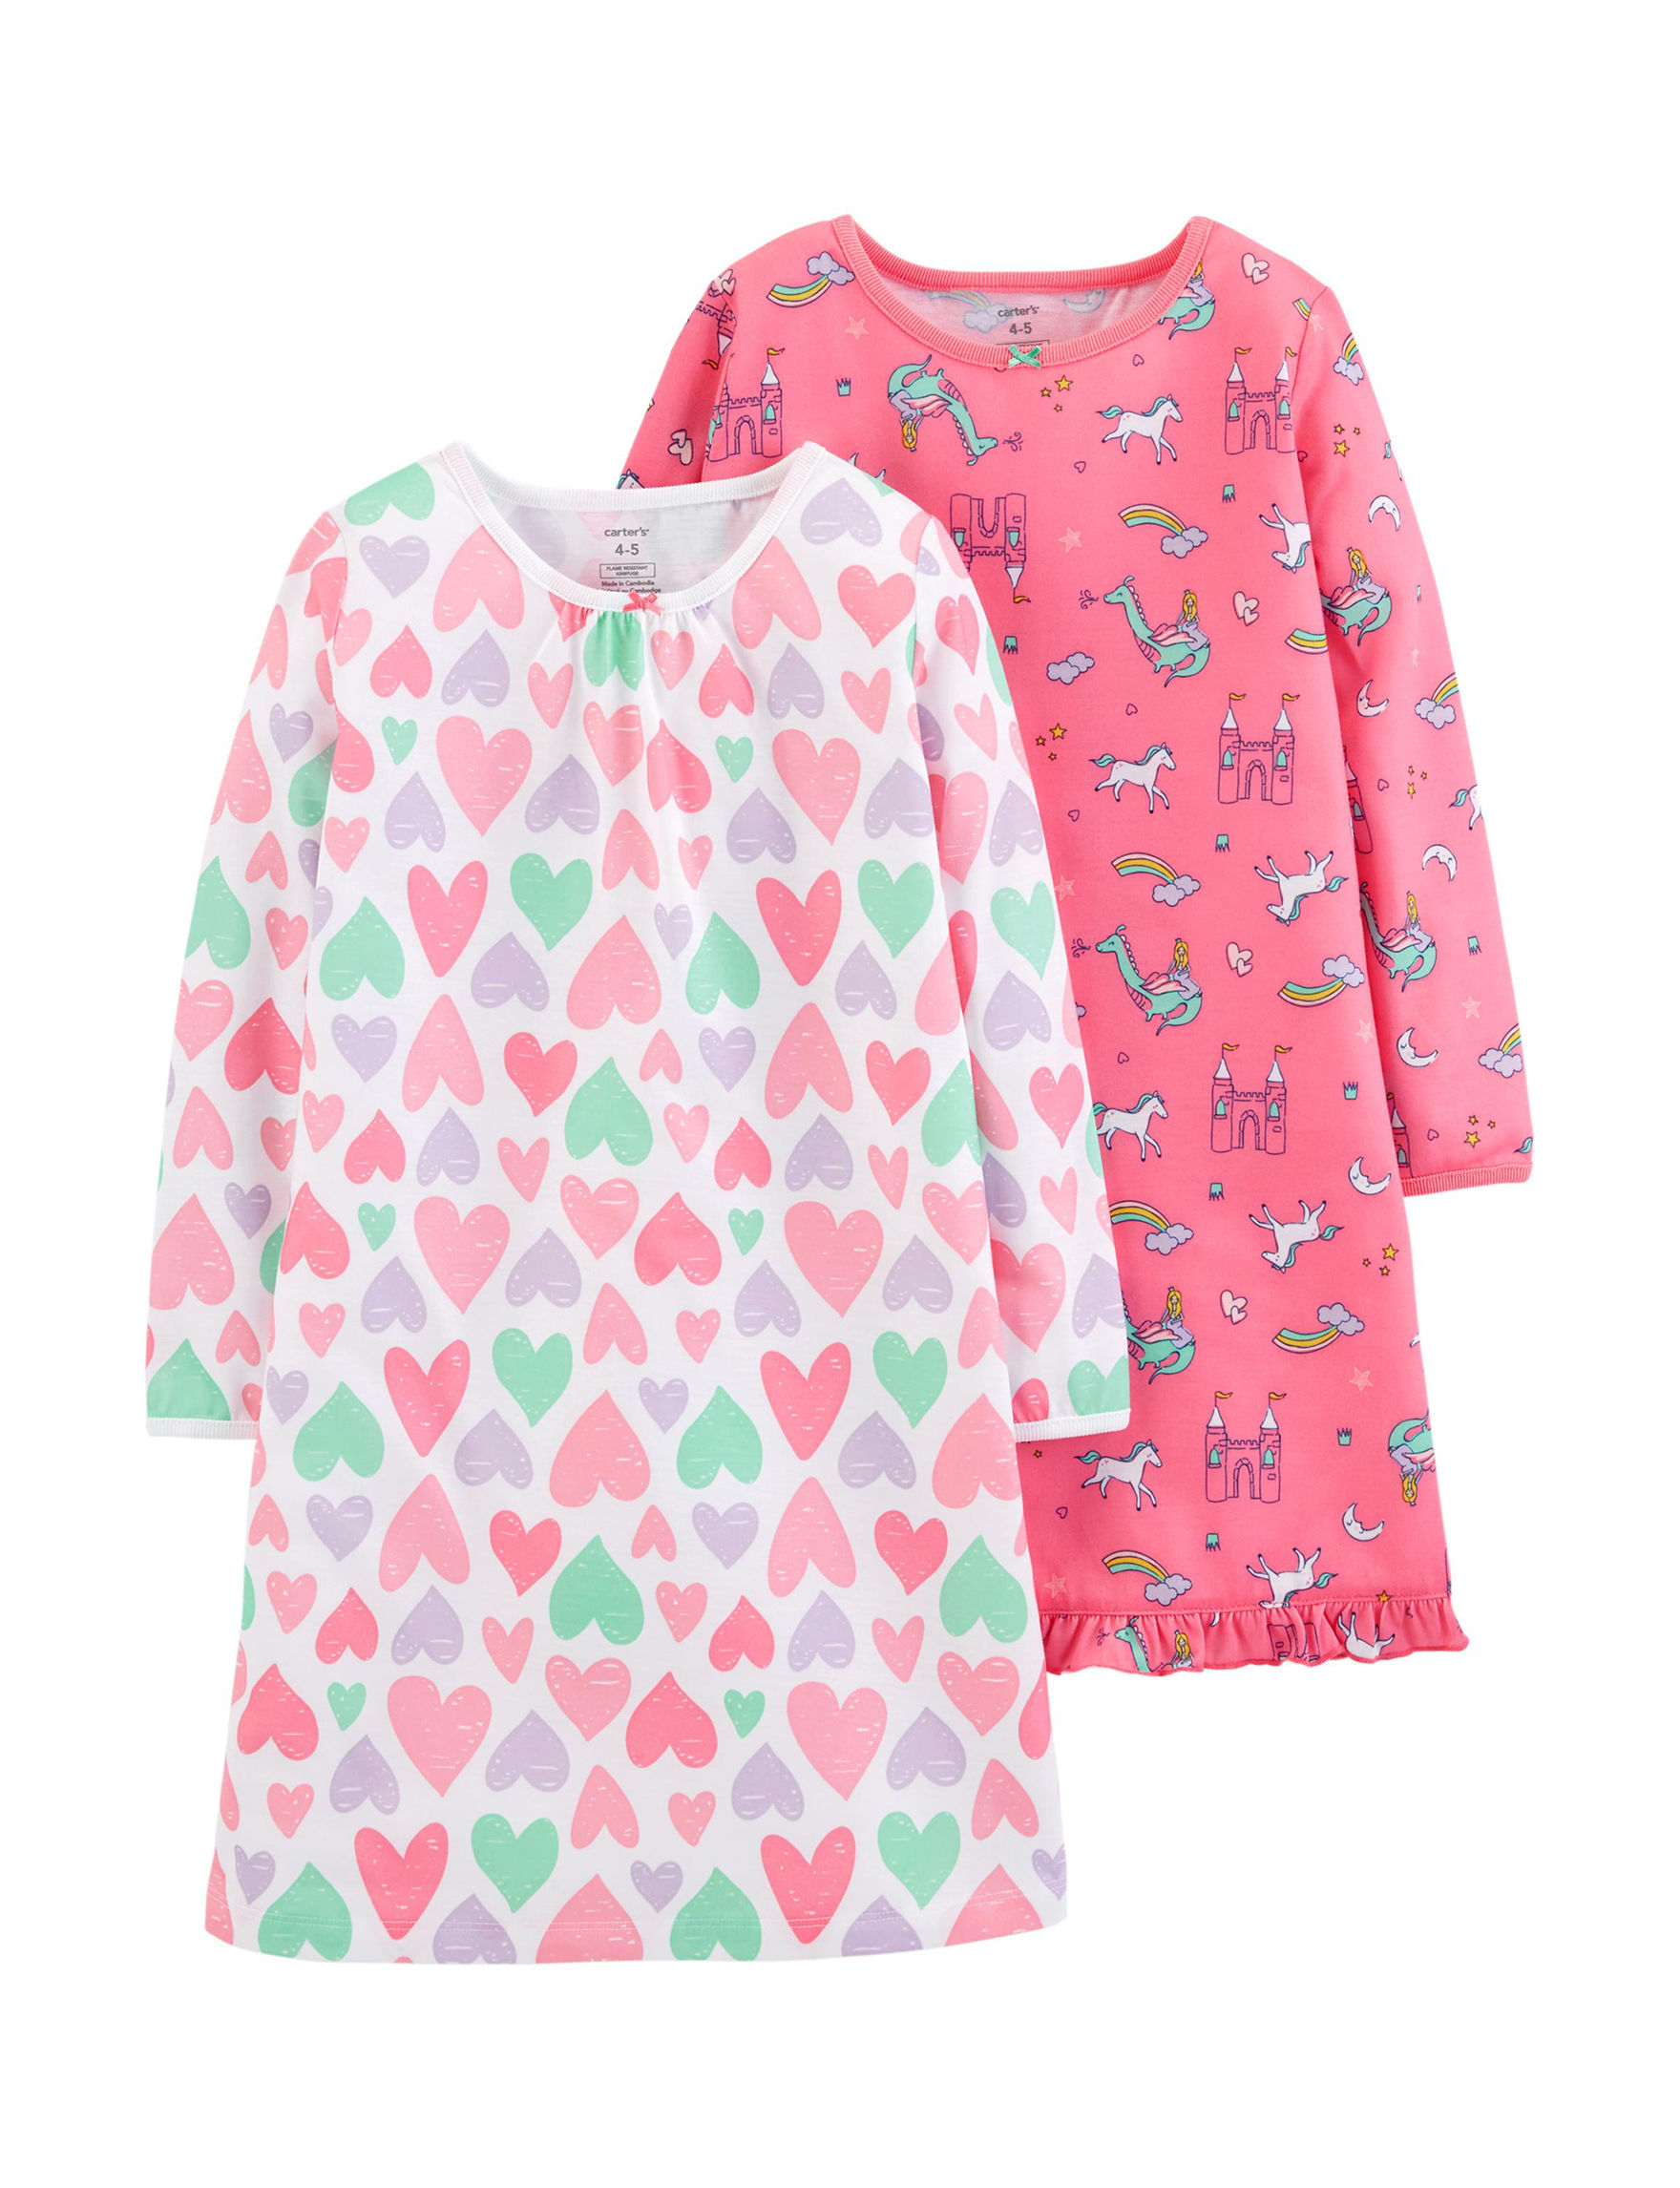 Carter's Pink Multi Nightgowns & Sleep Shirts